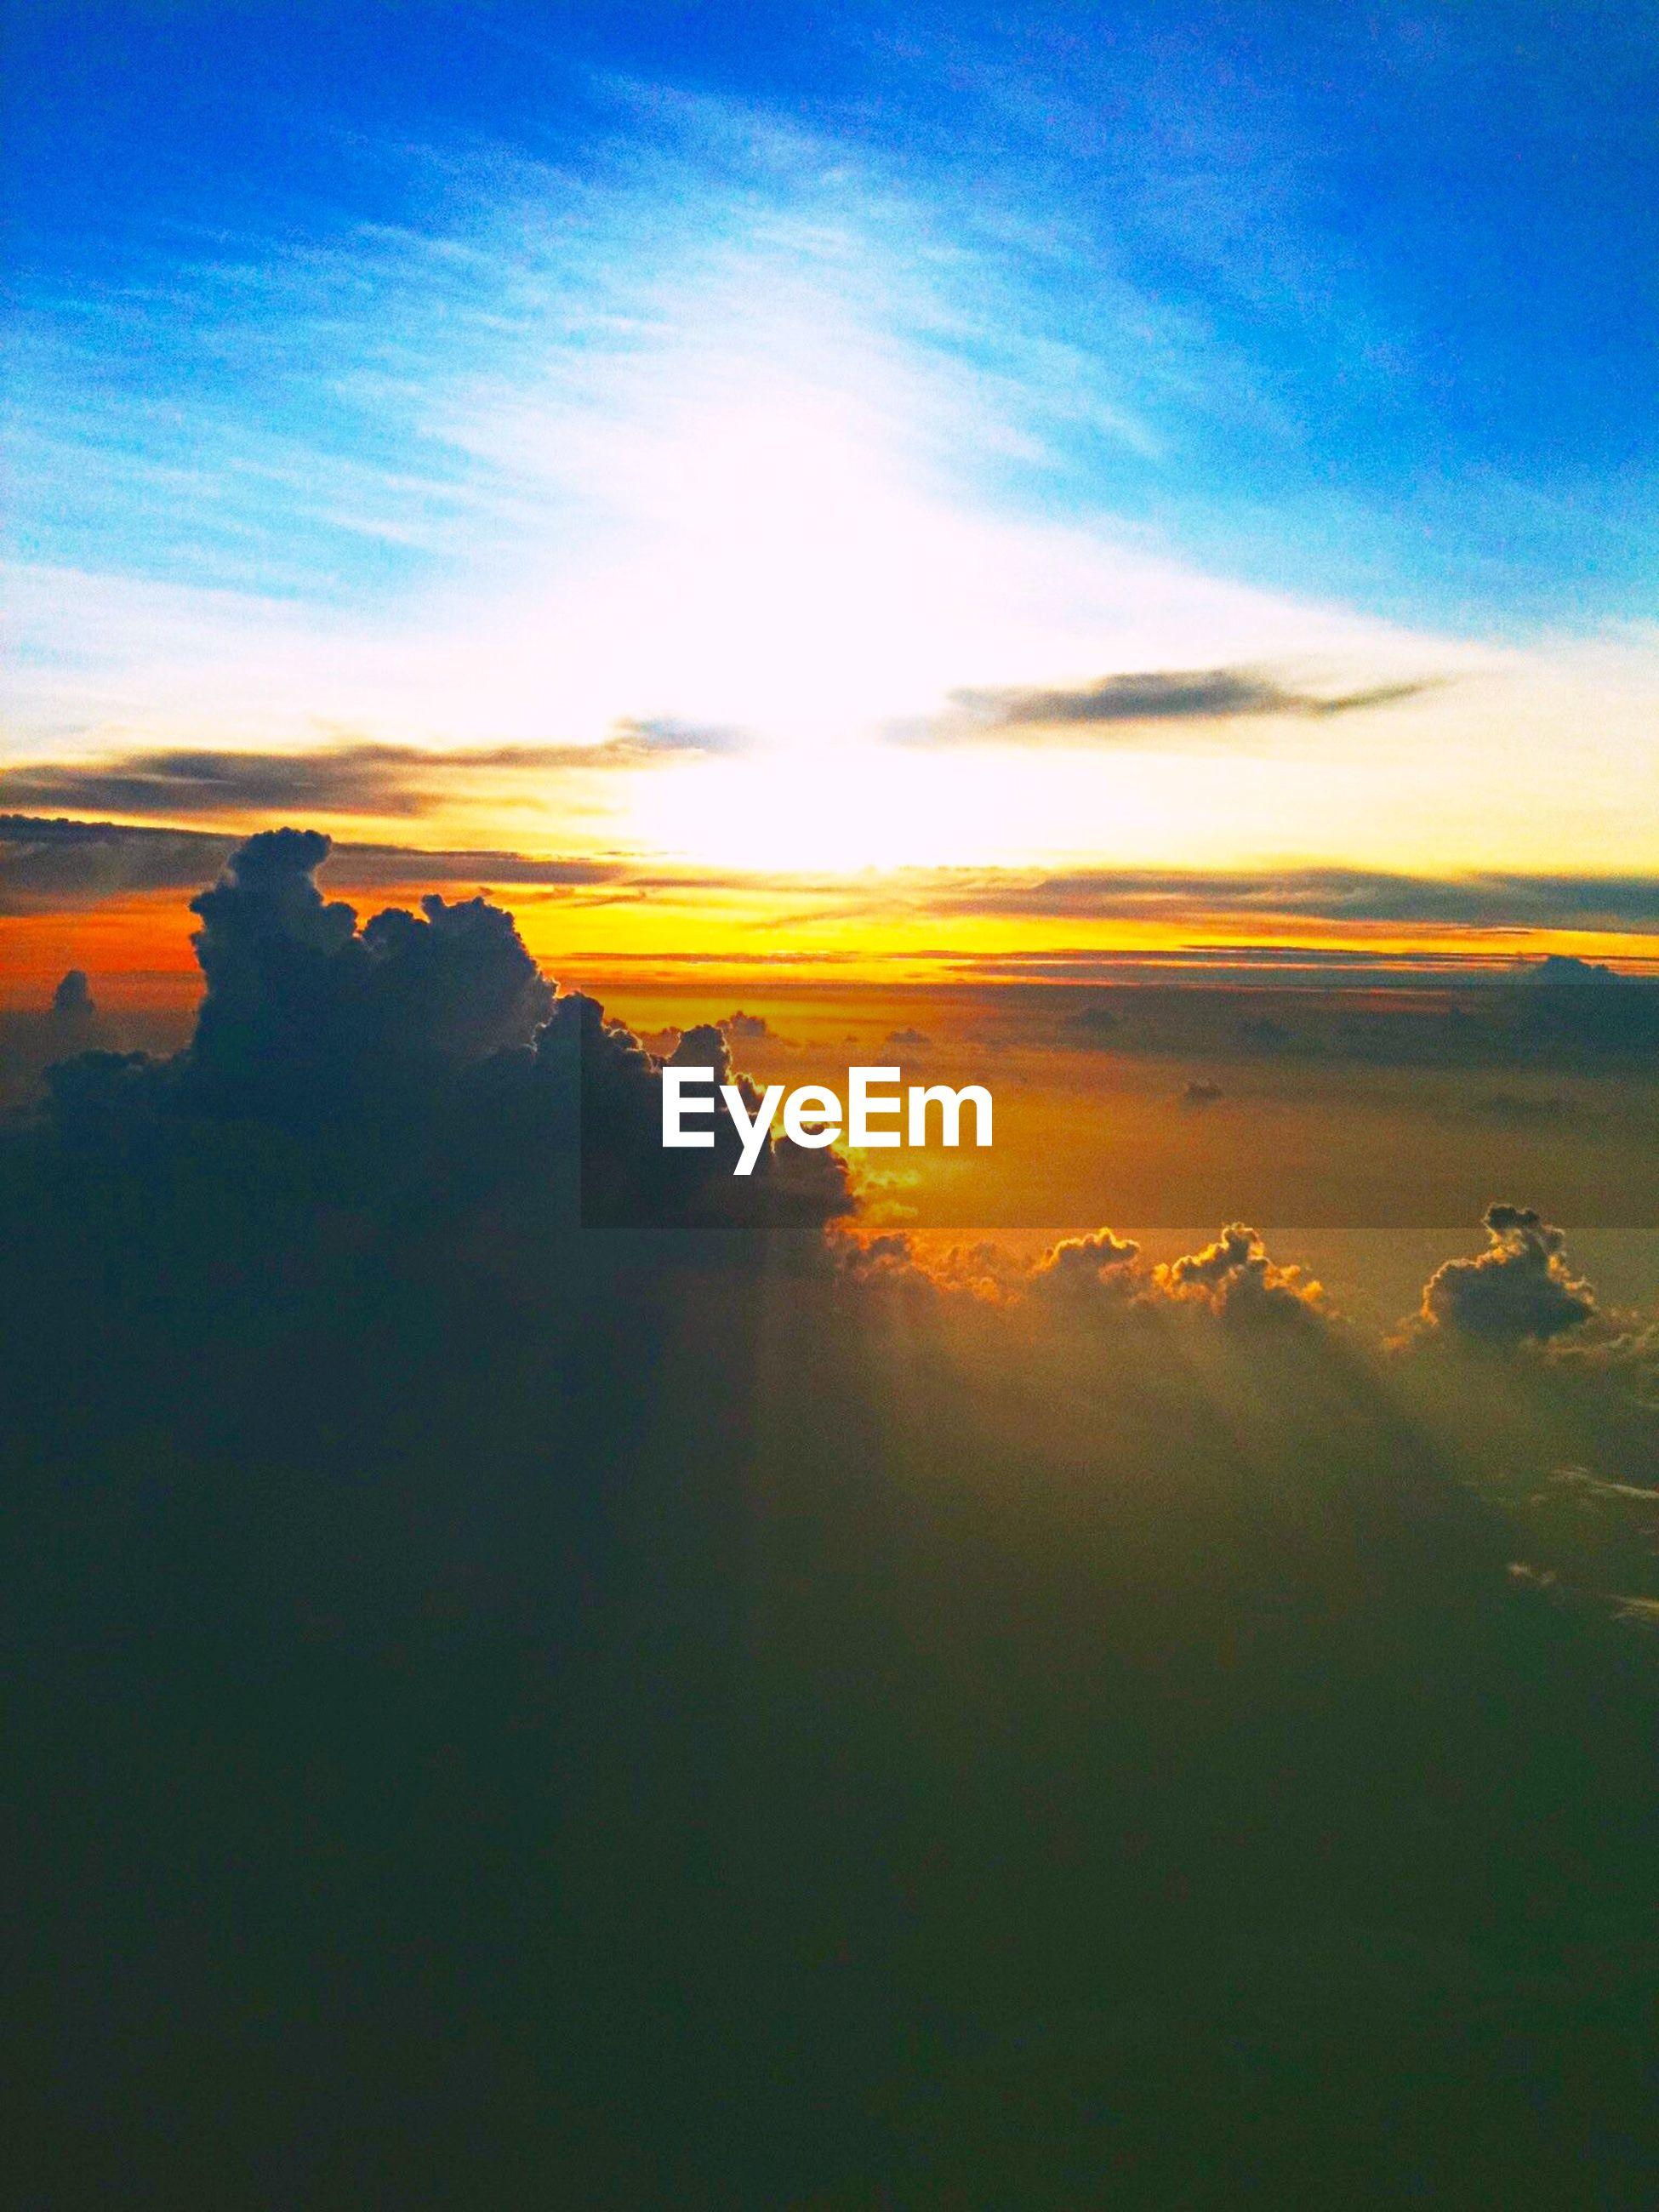 Idyllic shot of sunlight on clouds in sky